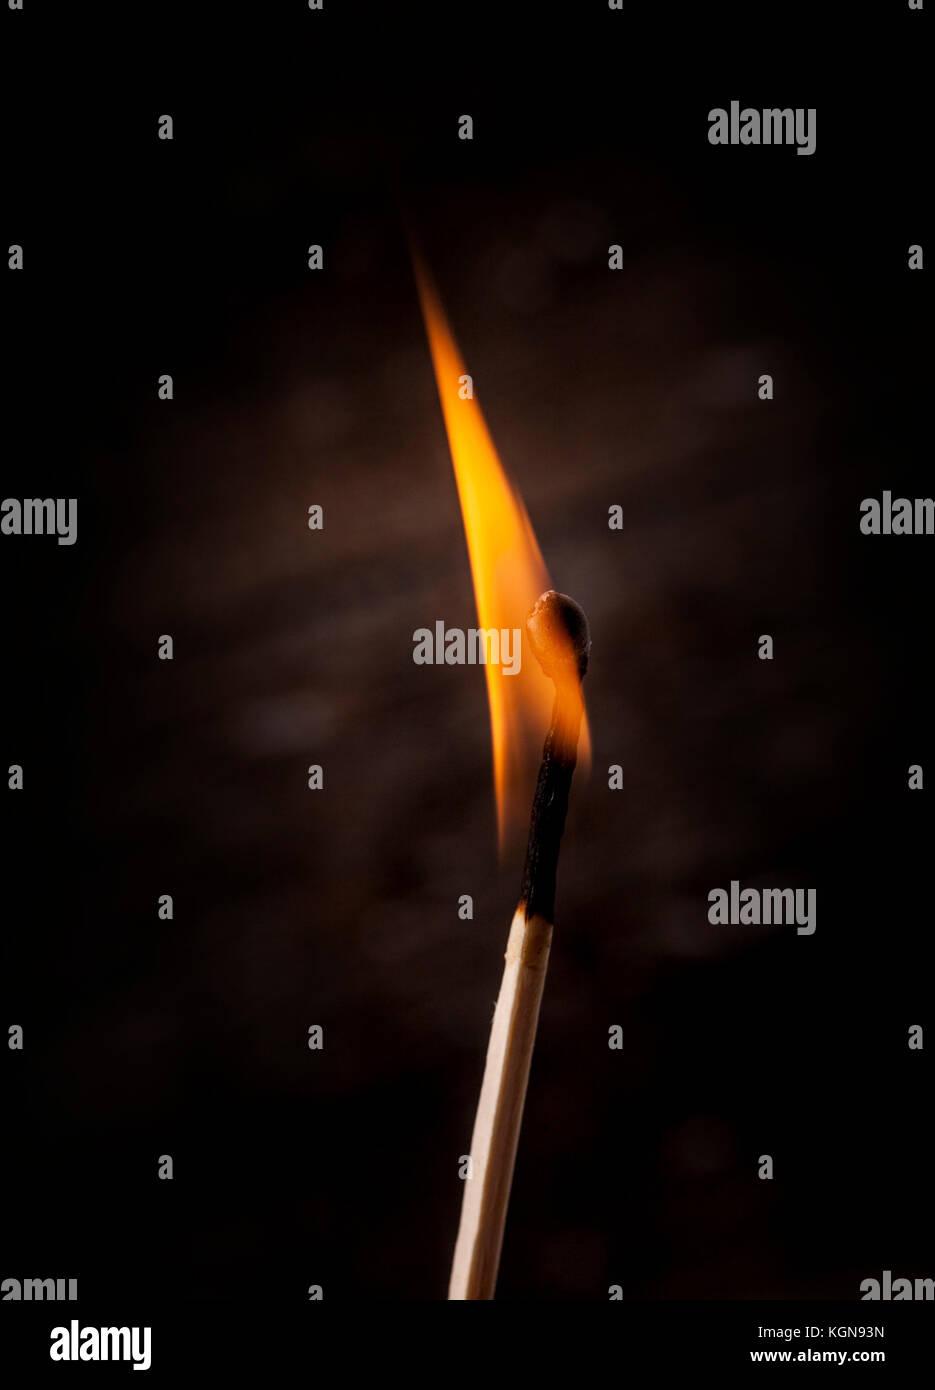 Matchstick burning on black background - Stock Image